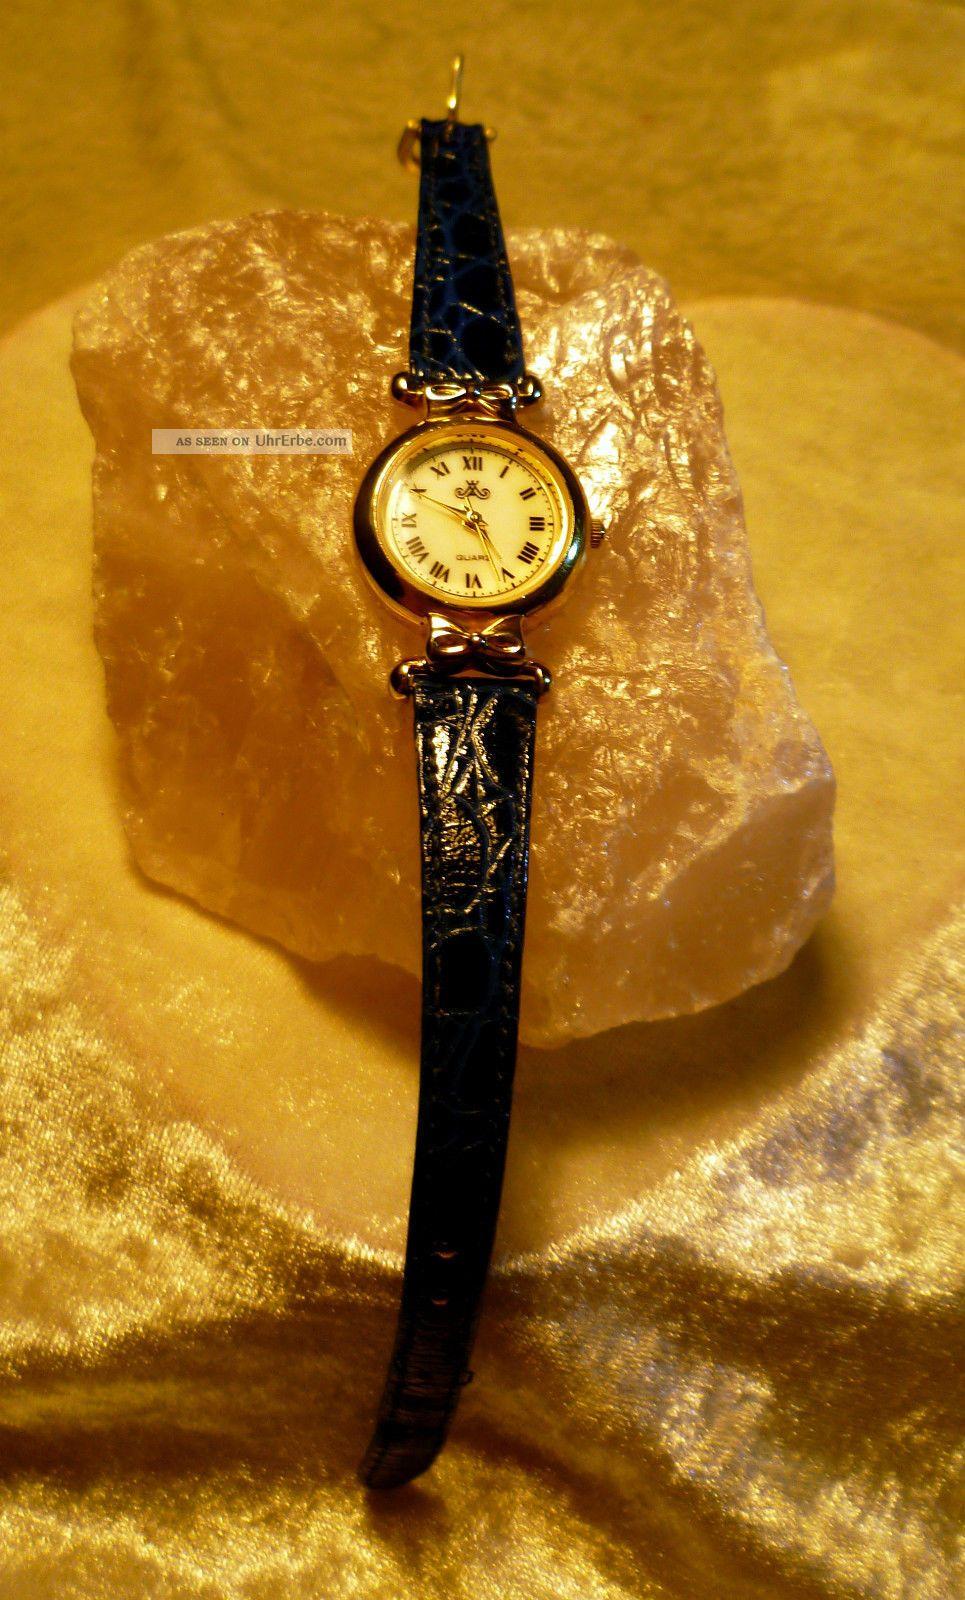 Meister Anker Damen Leder Armband Uhr 809.  181 1/109 Vintage Erbstück Von Oma Armbanduhren Bild